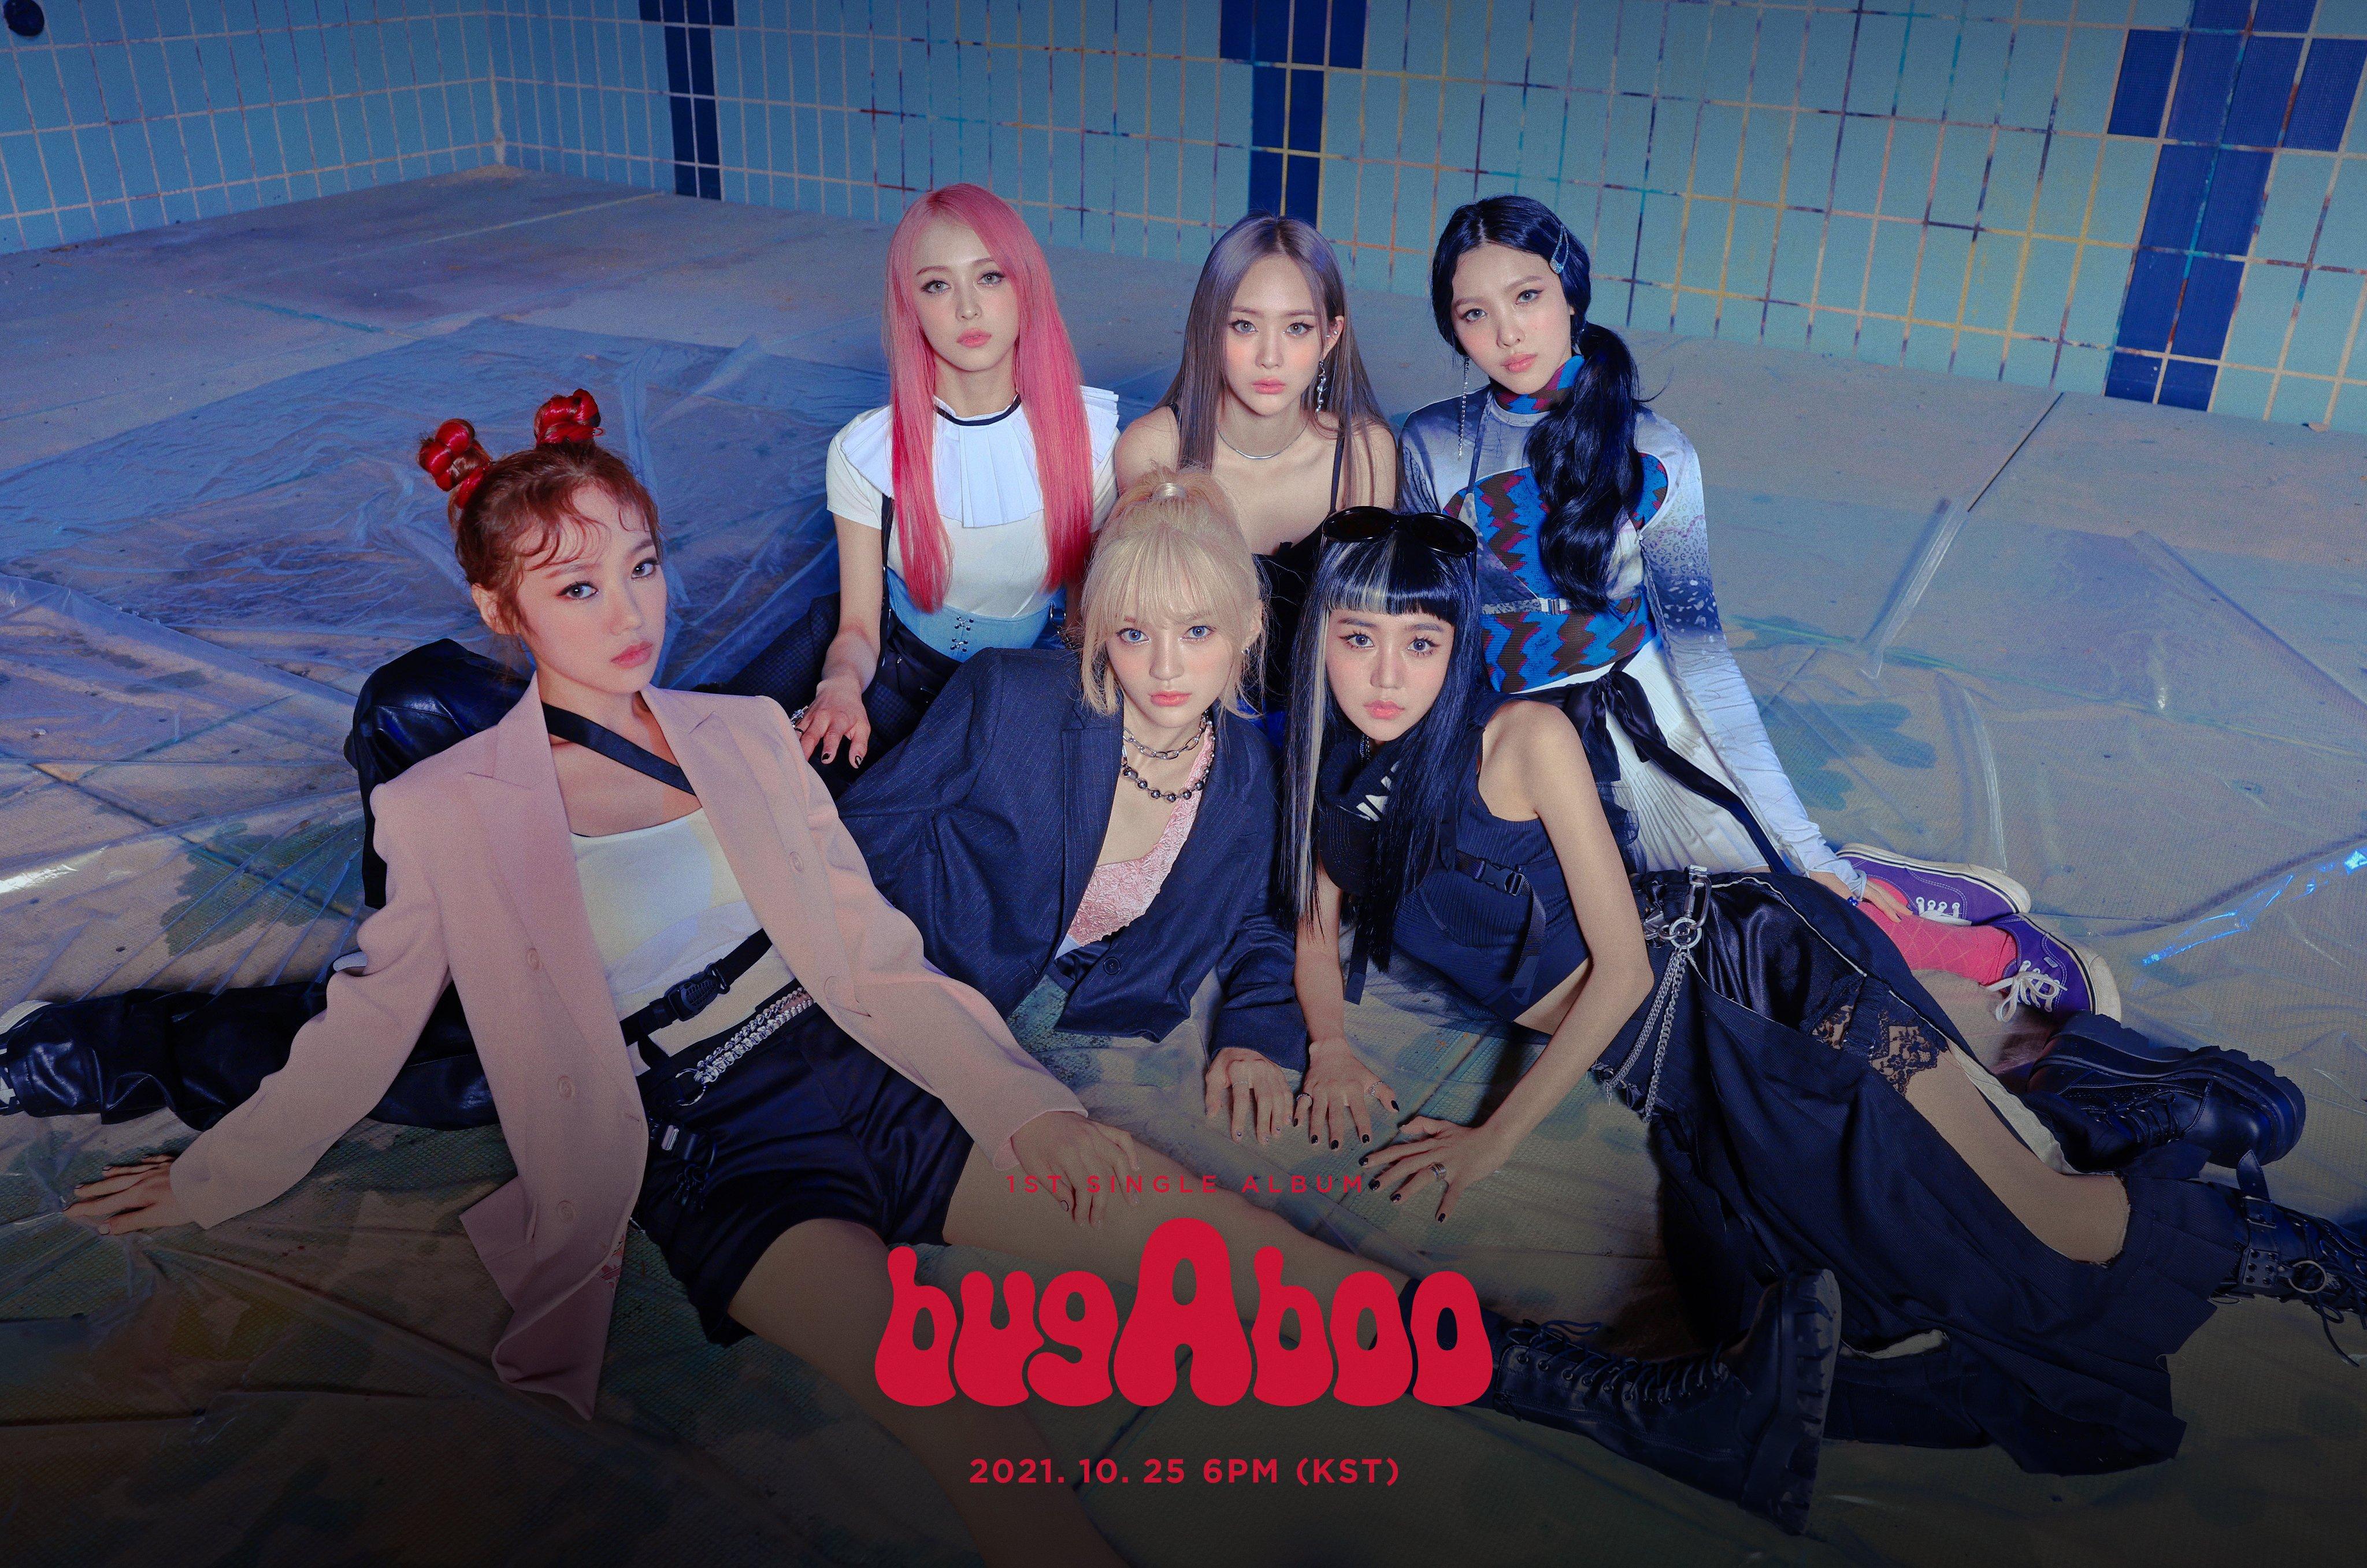 bugAboo bugAboo Teaser Group